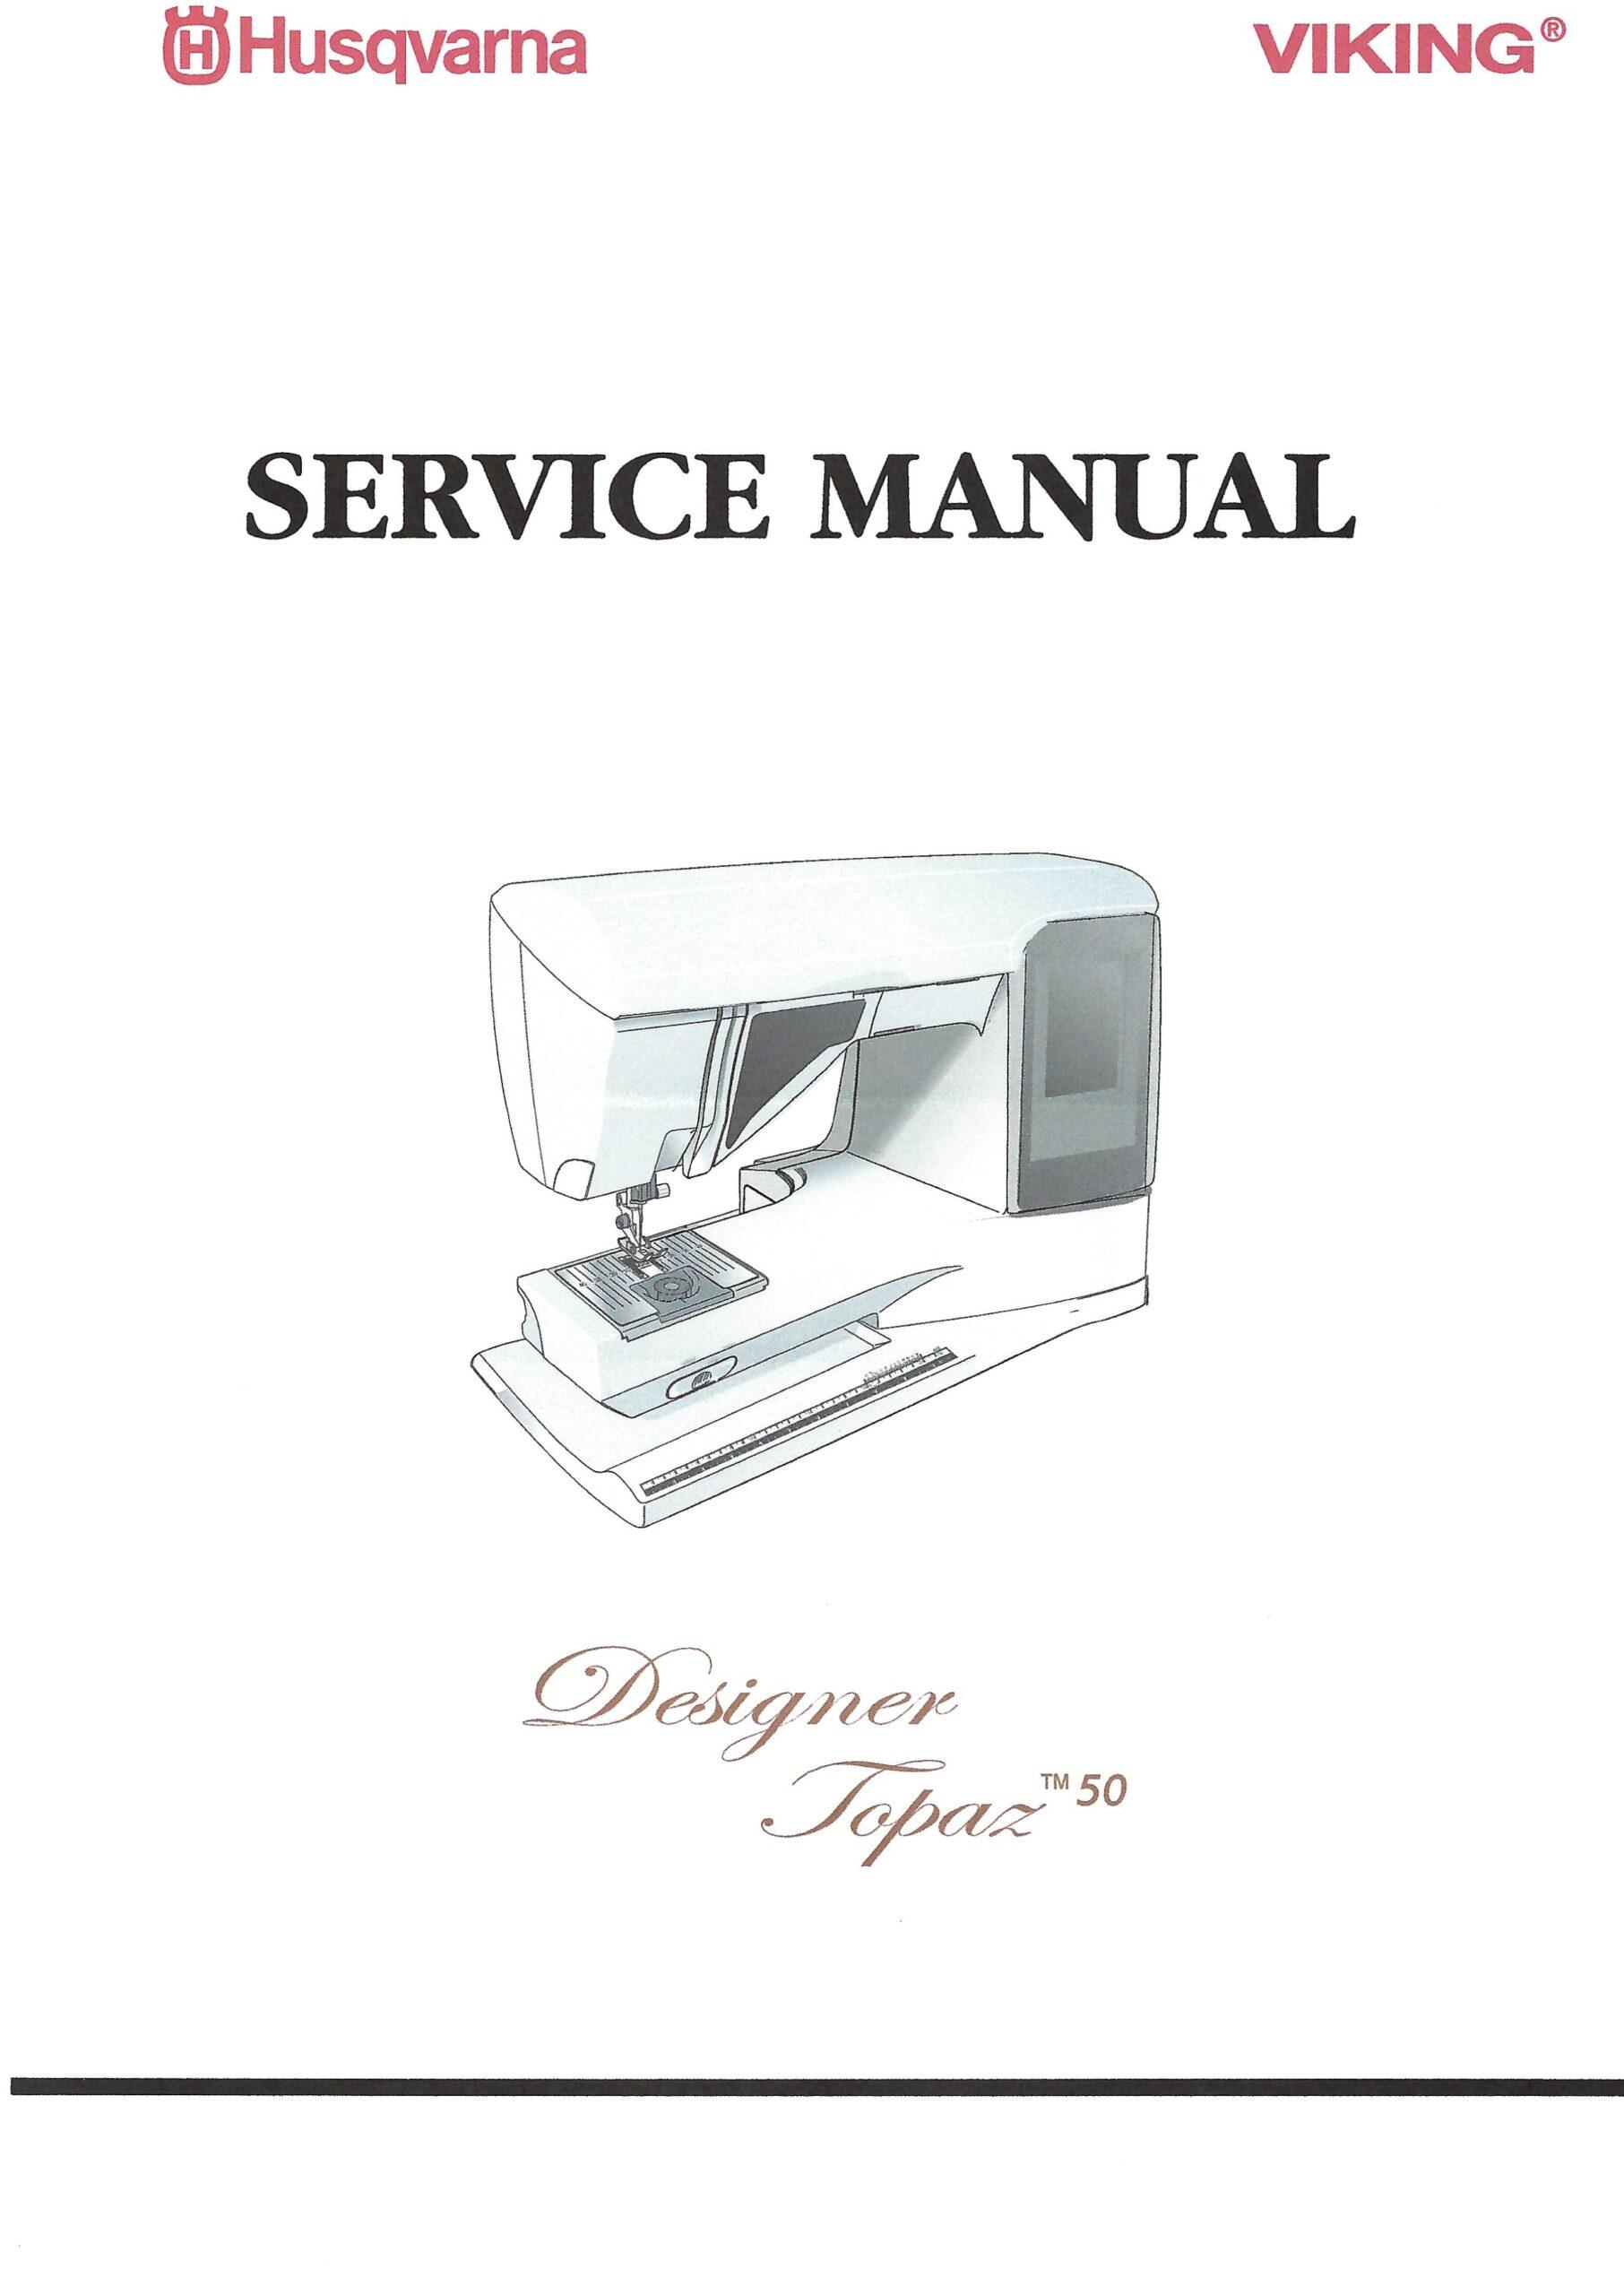 Service Manual Viking Designer Topaz 50 Sewing Machine